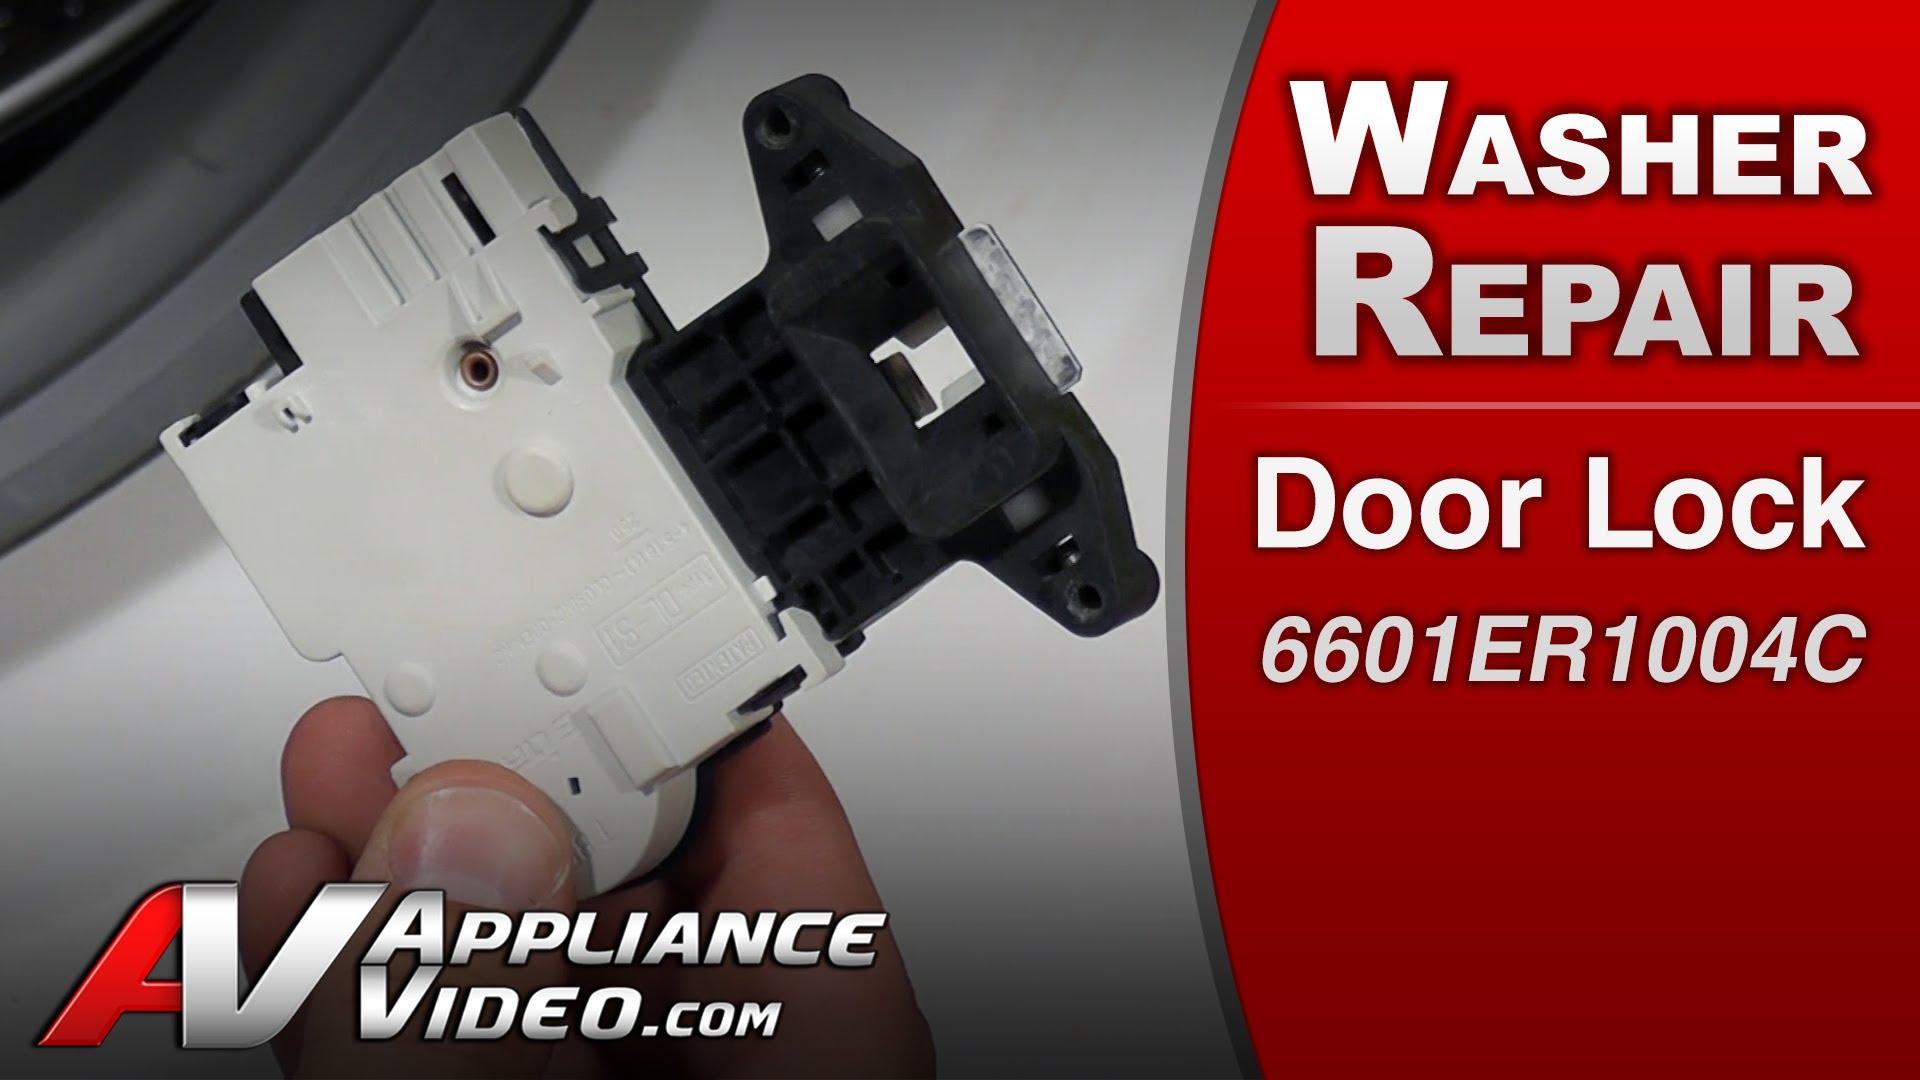 Lg Wm0532hw Washer Door Not Closing Appliance Video